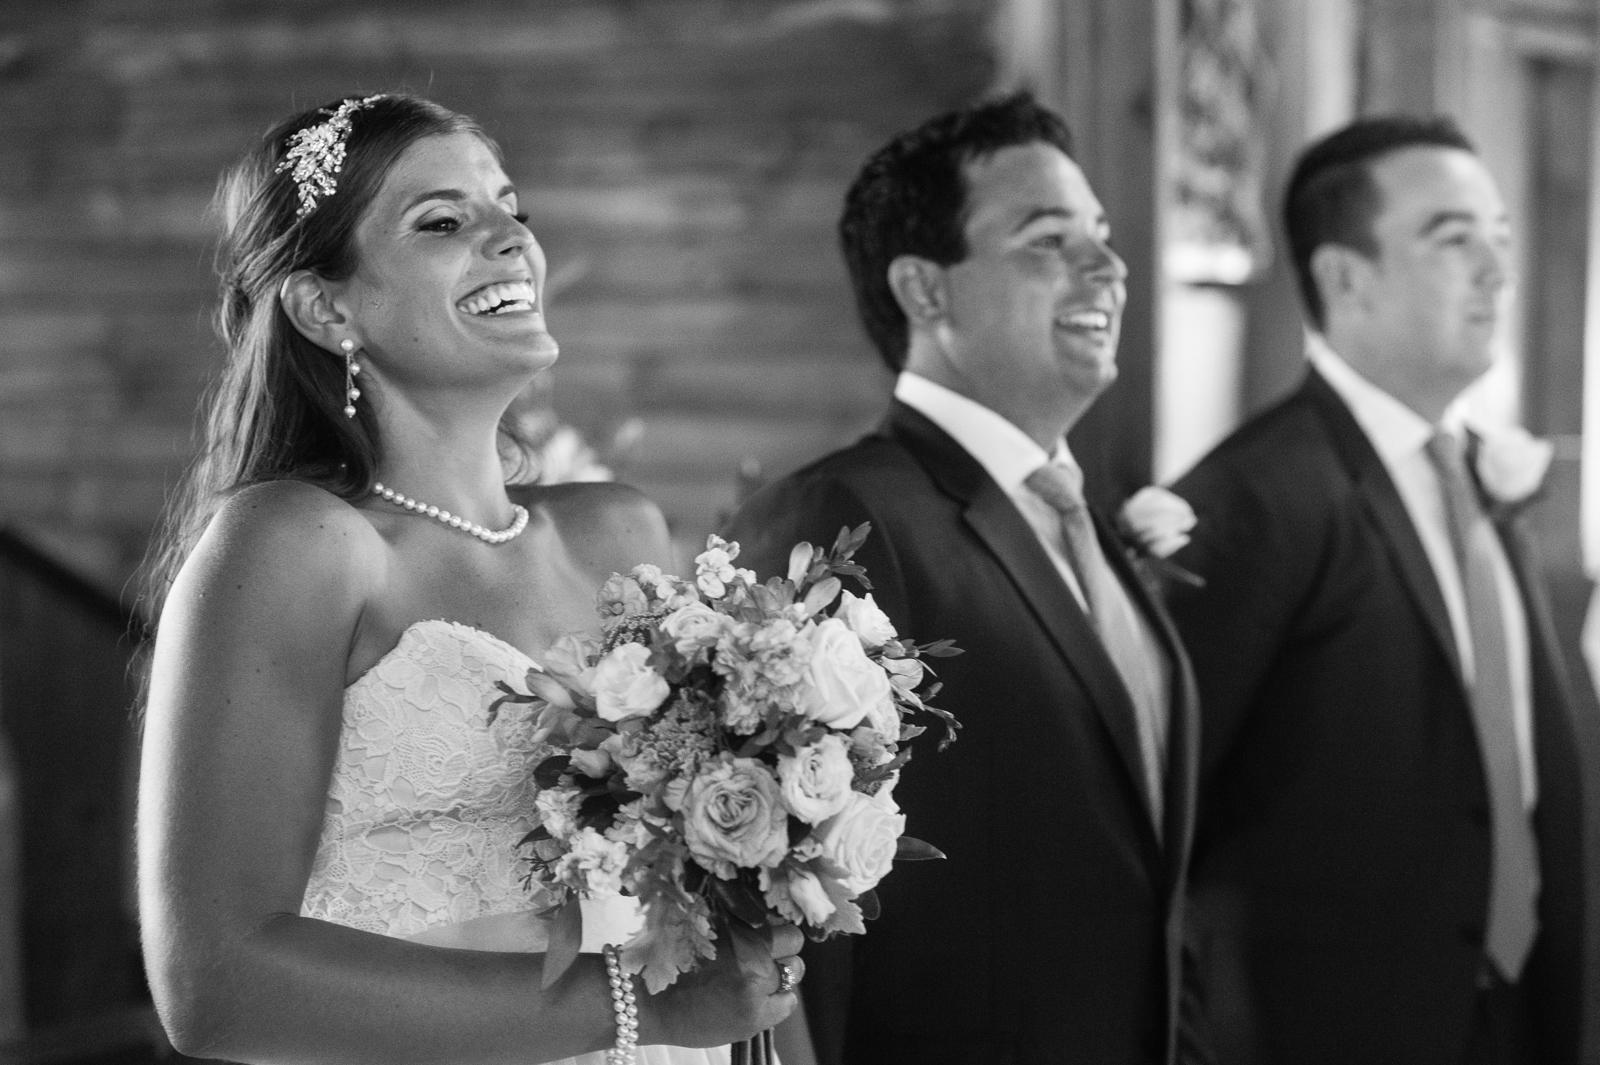 tara mcmullen photography muskoka wedding photographer st peters on the rock wedding photos muskoka wedding photos where to get married in muskoka camp ooch wedding-033